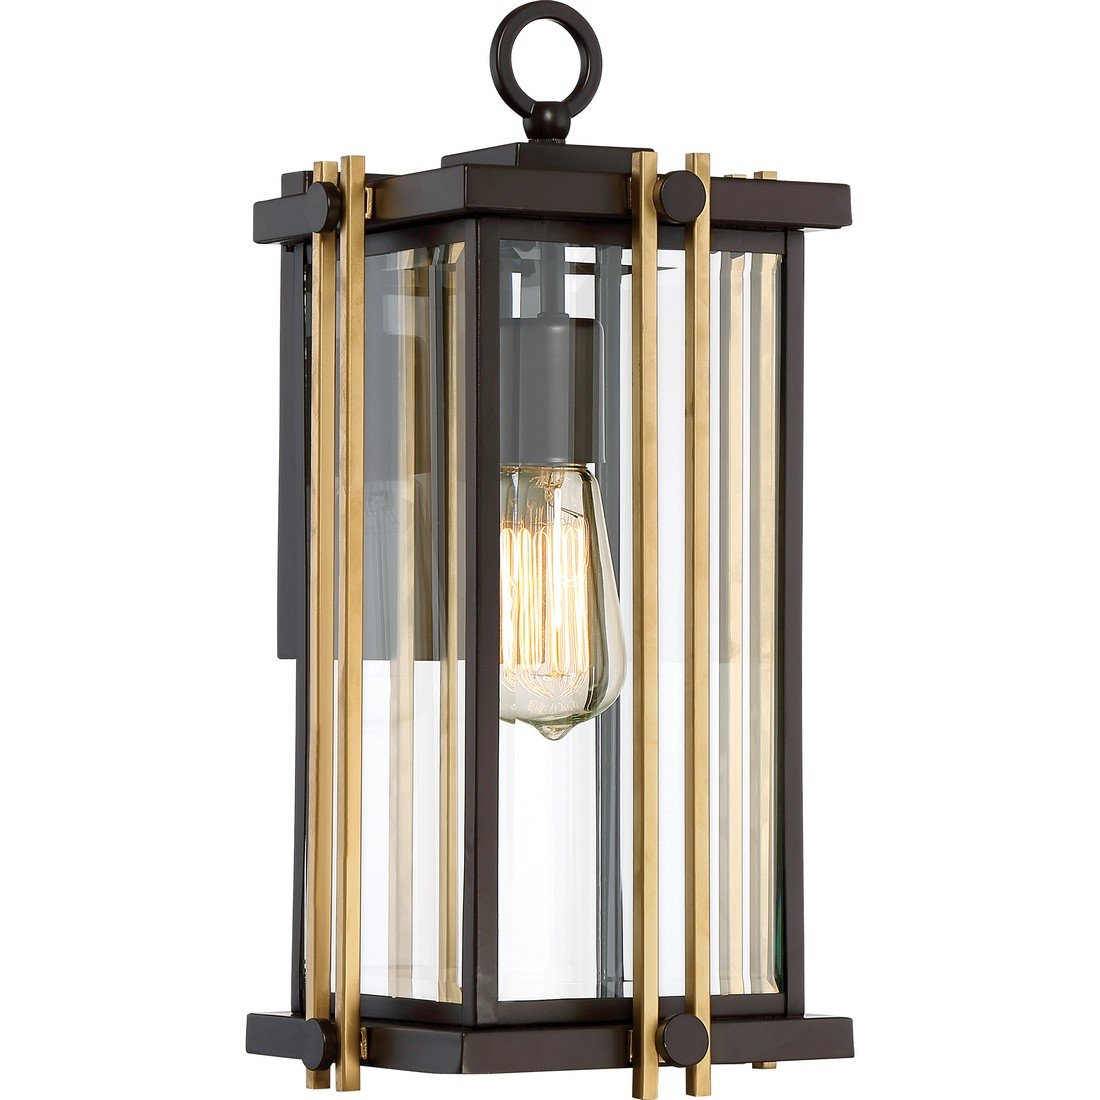 Quoizel One Light Outdoor Wall Lantern GLD8408WT, Medium, Western Bronze